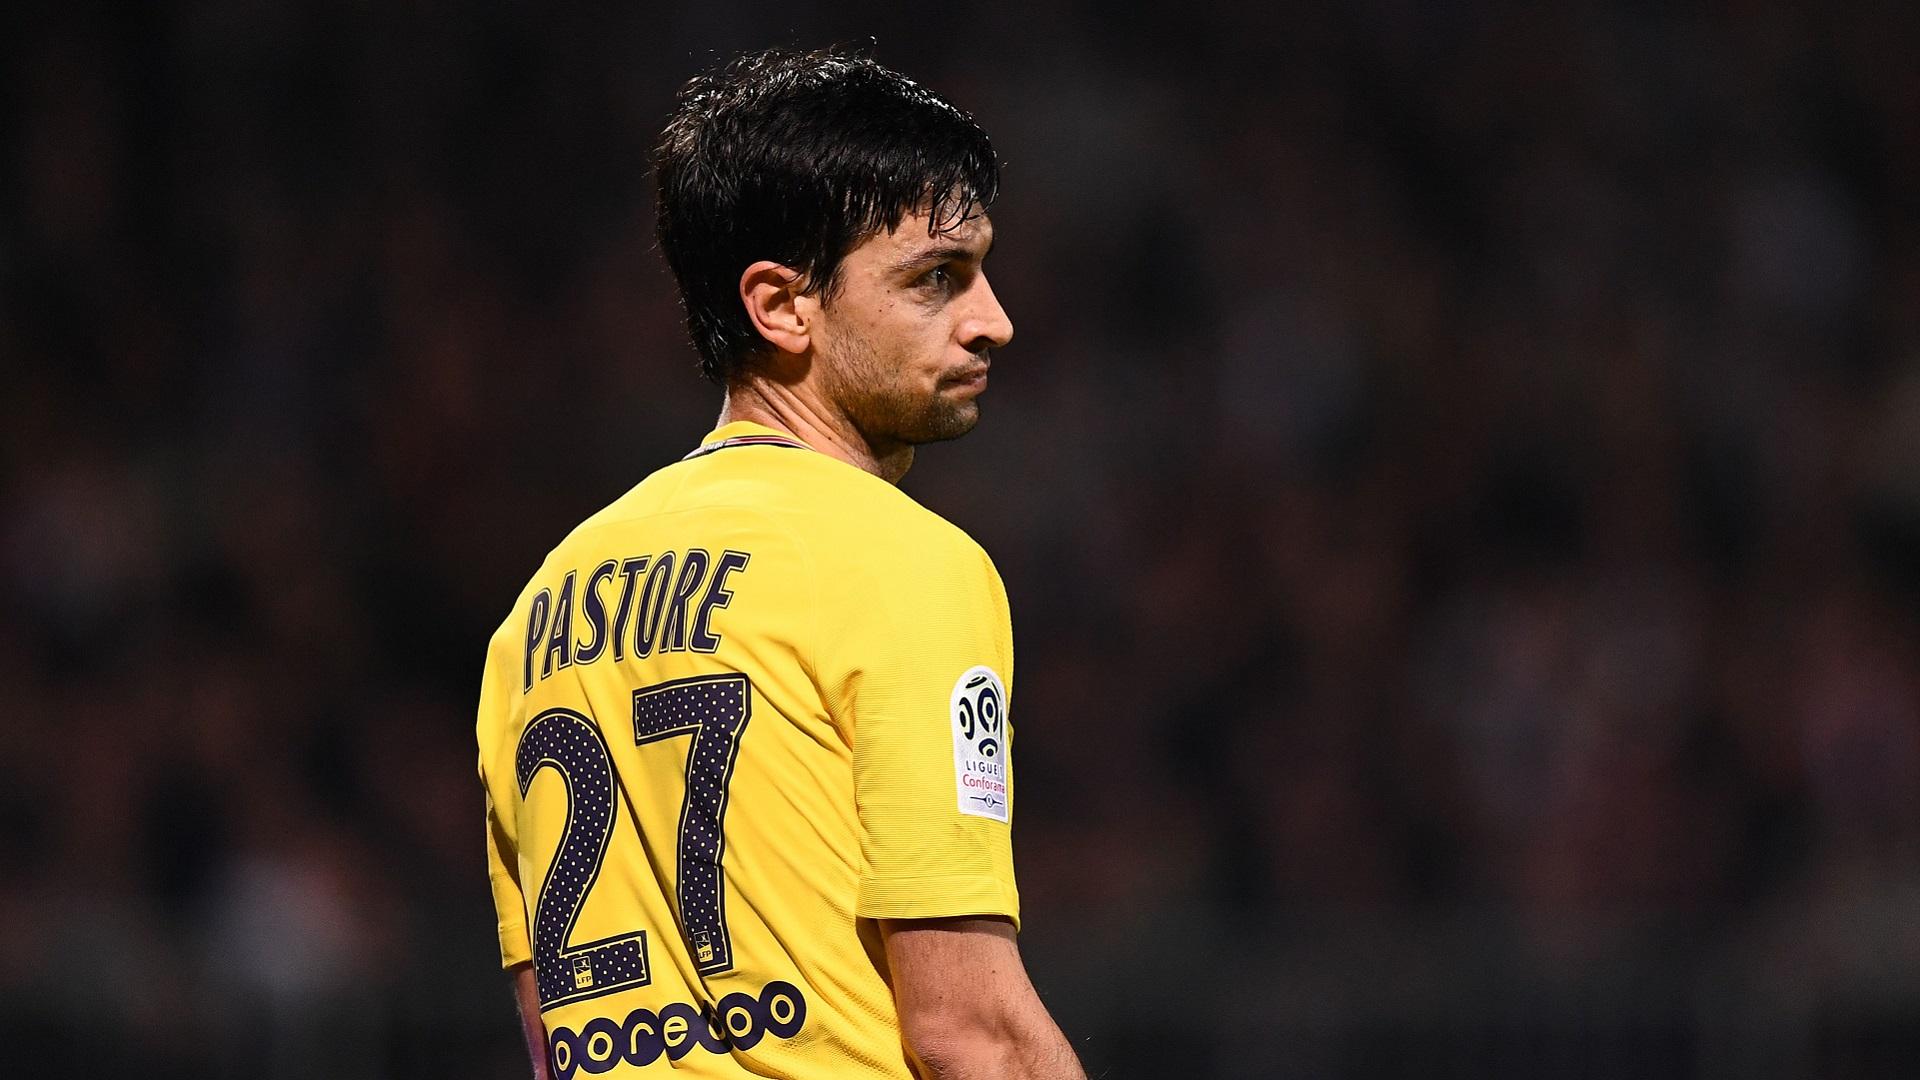 2018-01-30 Pastore PSG